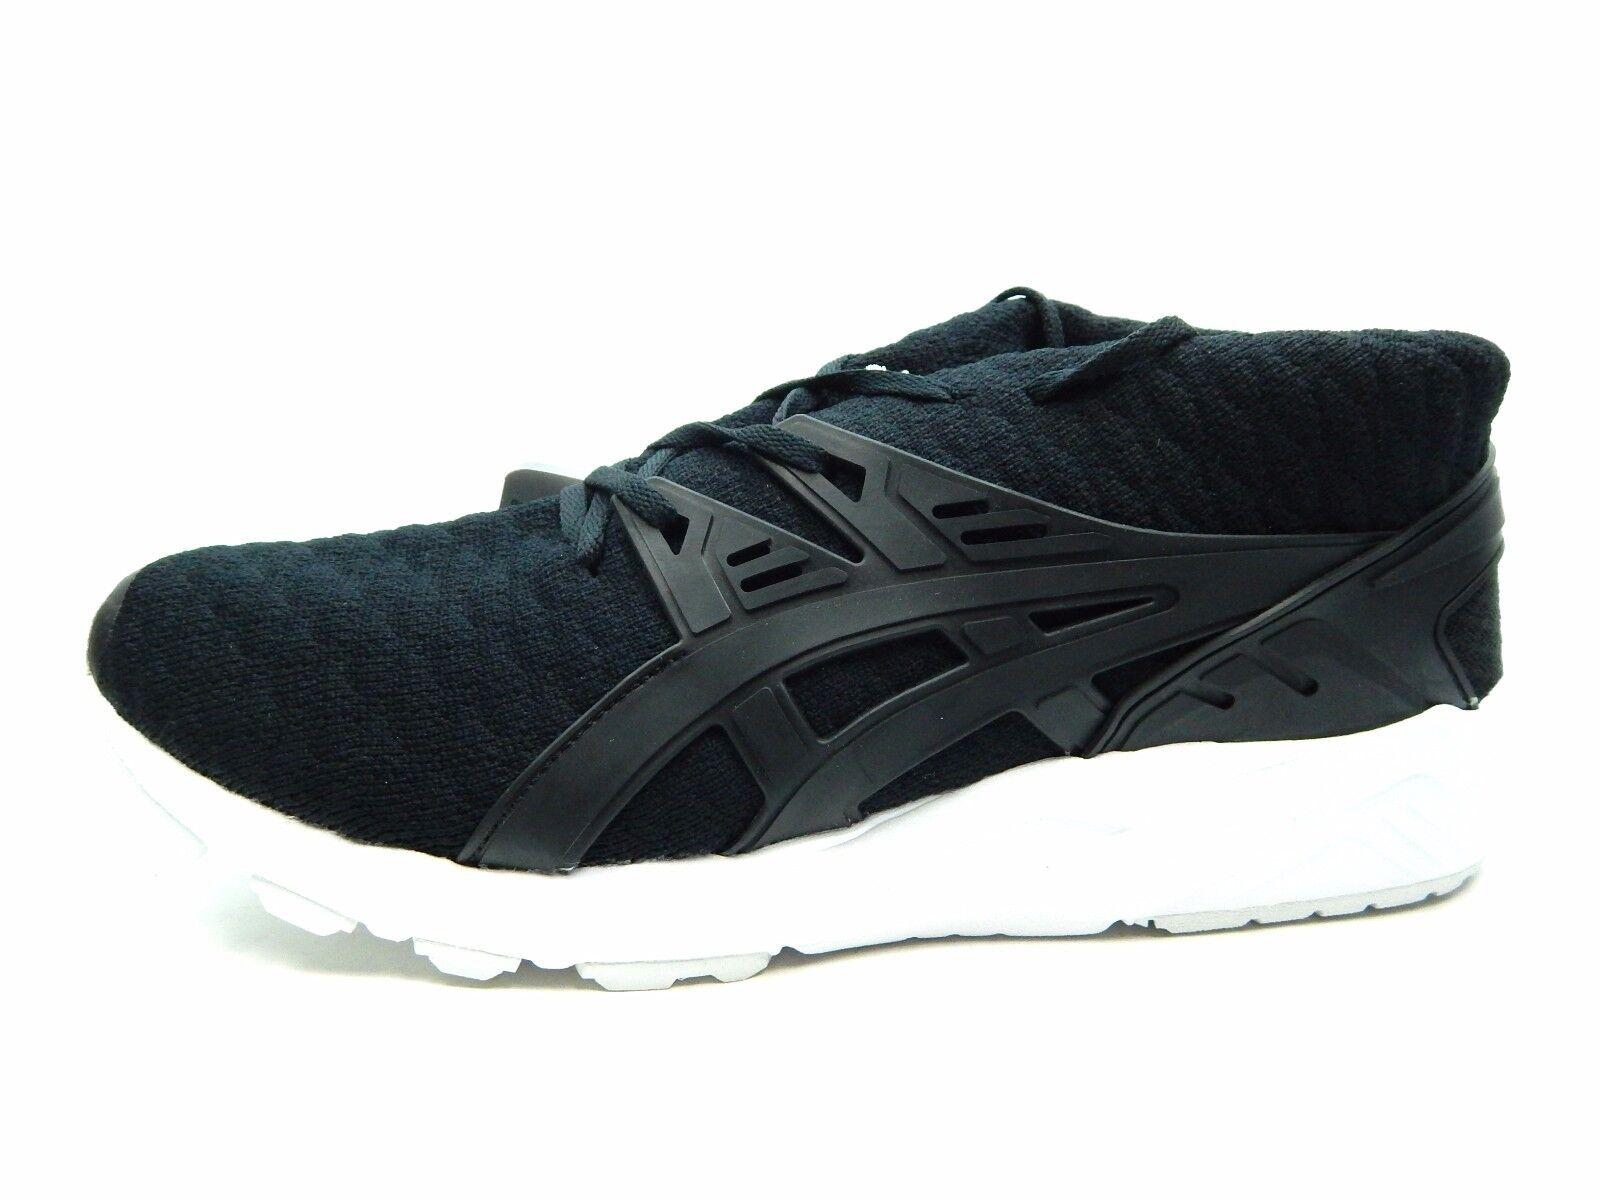 ASICS GEL KAYANO Trainer KNIT MT H7P4N 9090 Noir Hommes Chaussures